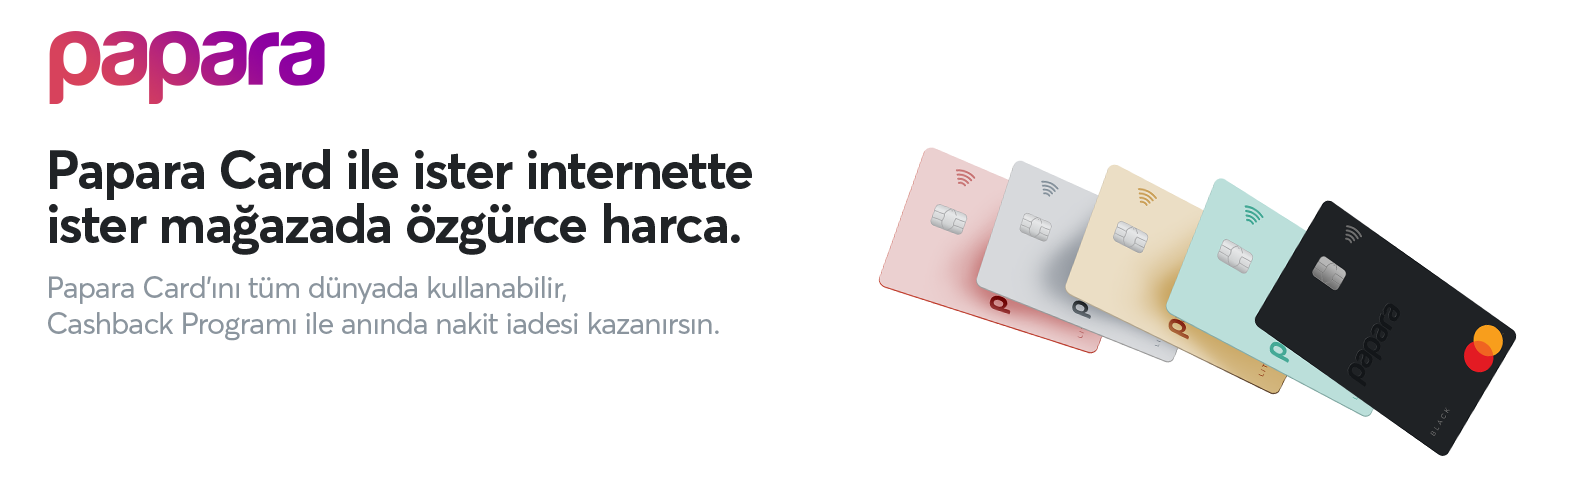 Papara_Comasist_cards-1